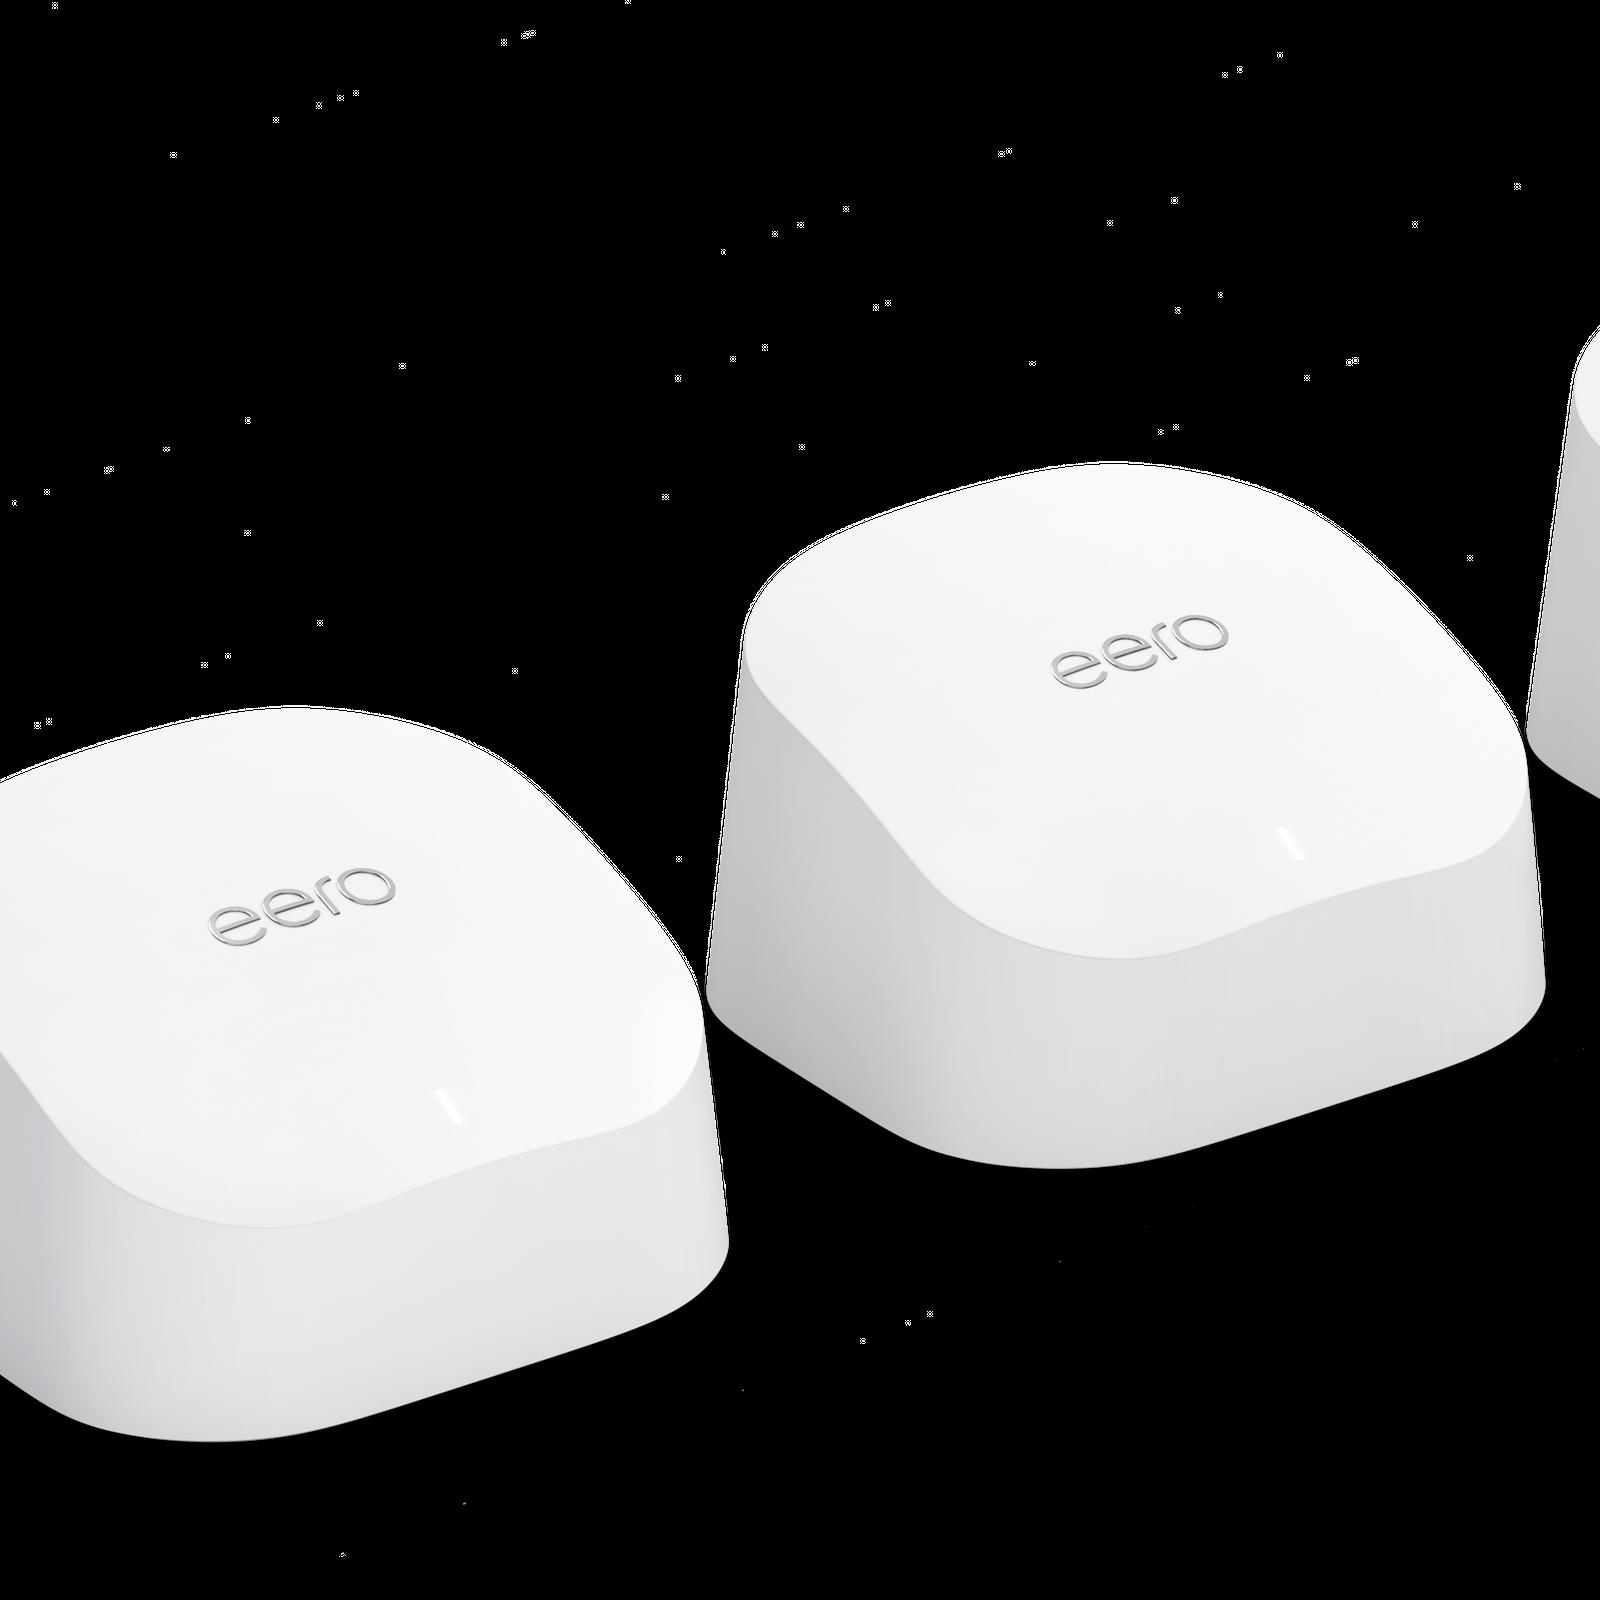 eero 6 TrueMesh Wi-Fi 6 Dual-Band System (3 Pack)